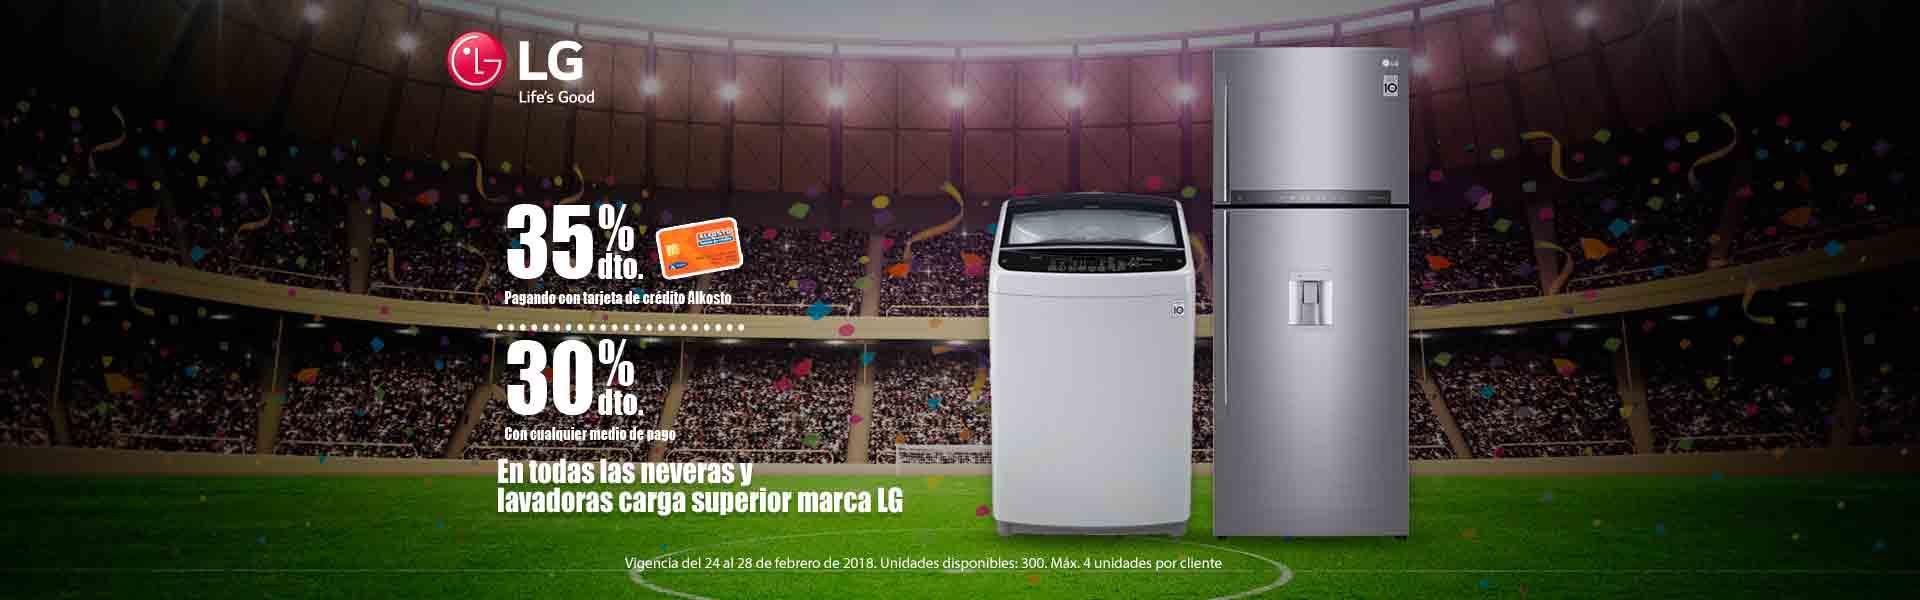 PPAL-KT-5-lb-descuentos-lg-lavado-refrigeracion-cat-febrero24-28